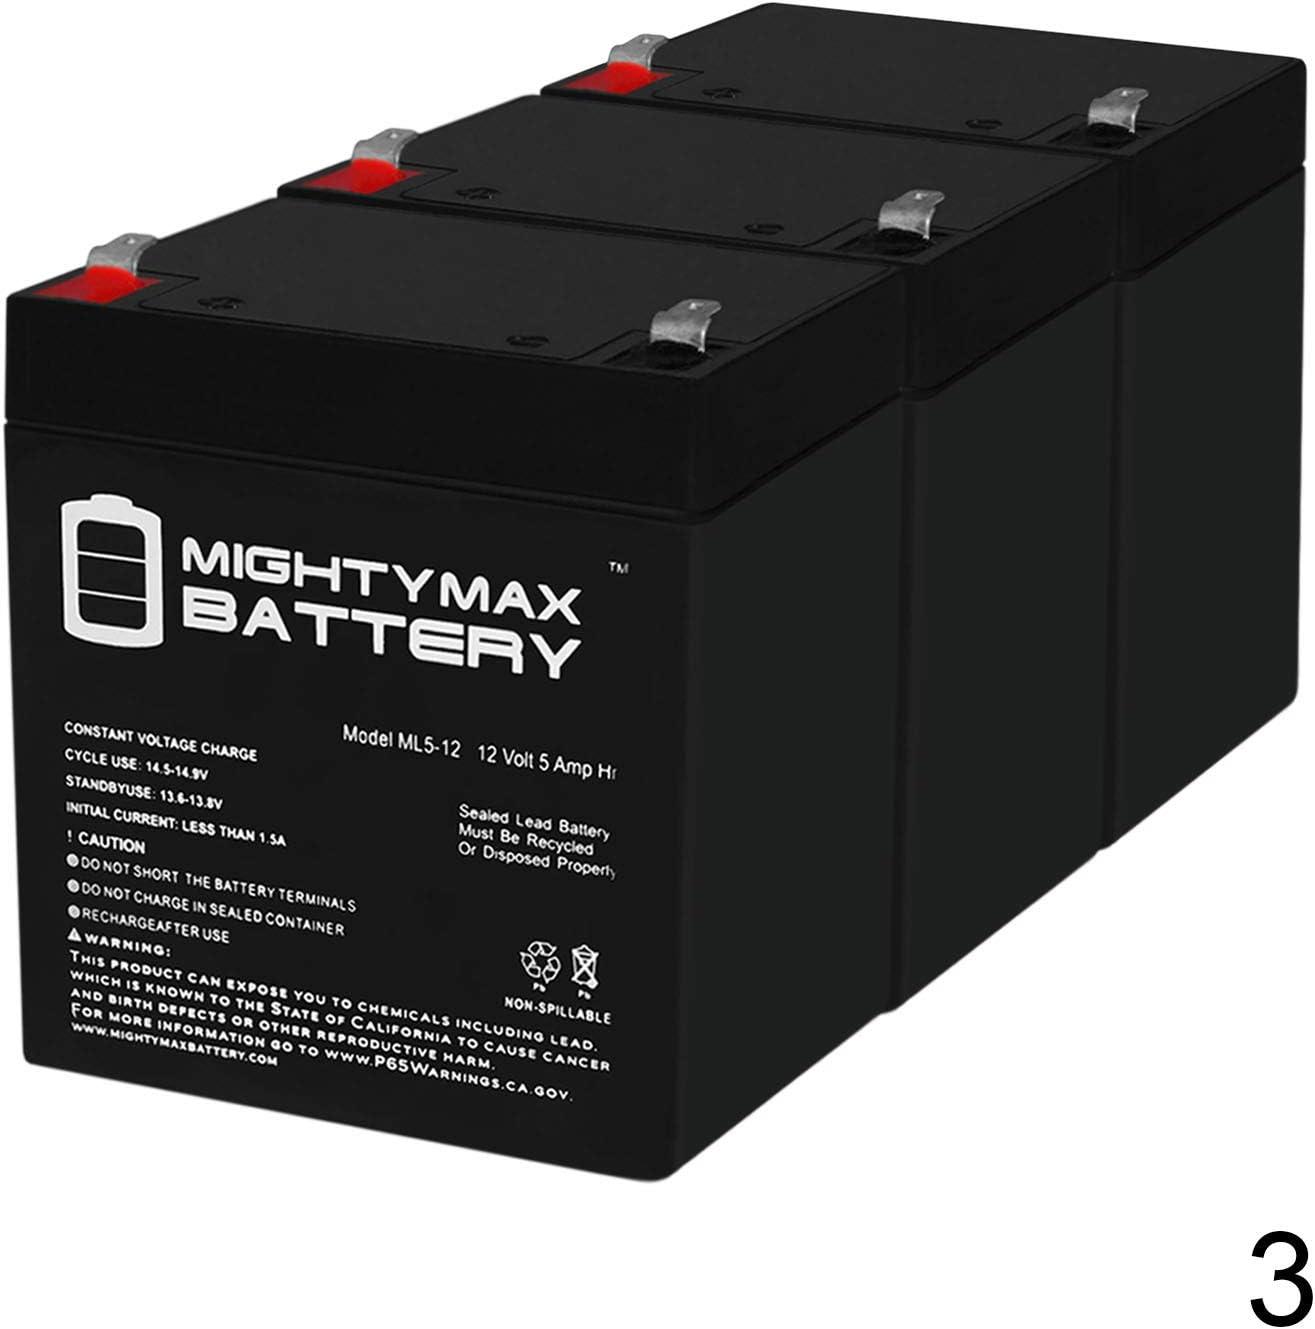 3 Pack Brand Product SUA2200RM2U Mighty Max Battery 12V 5Ah Replaces APC Smart-UPS 2200VA USB SER